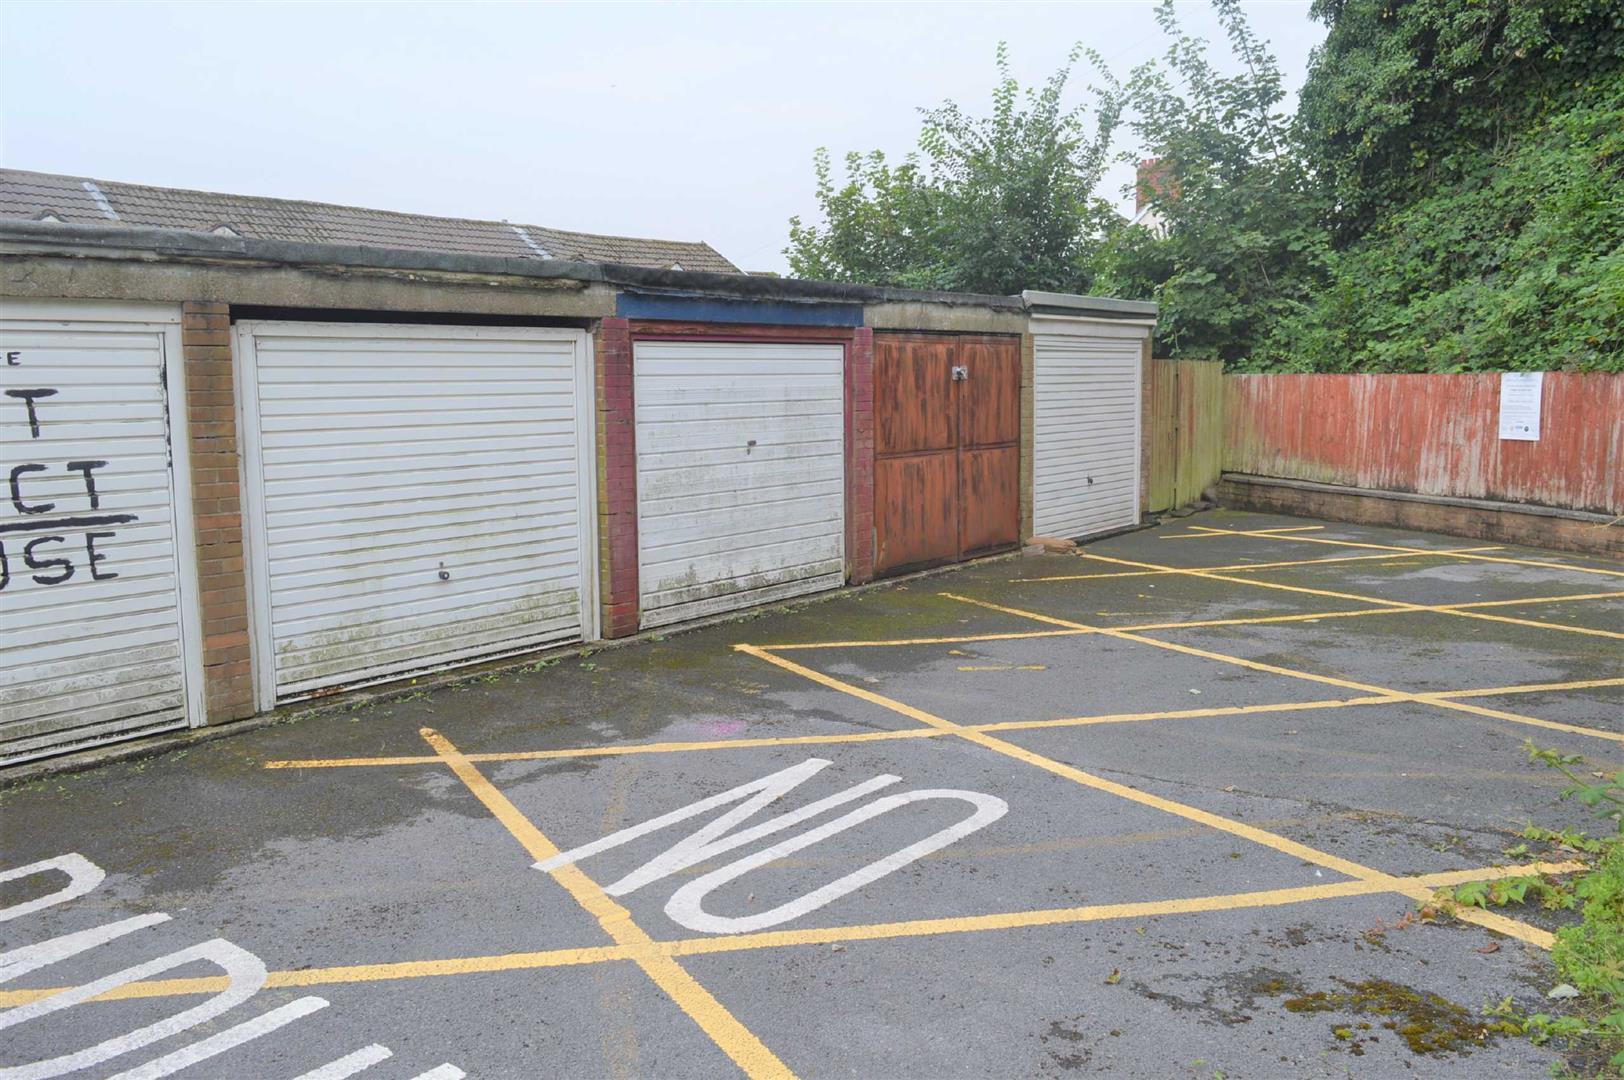 Windsor Court, Swansea, SA1 6EF